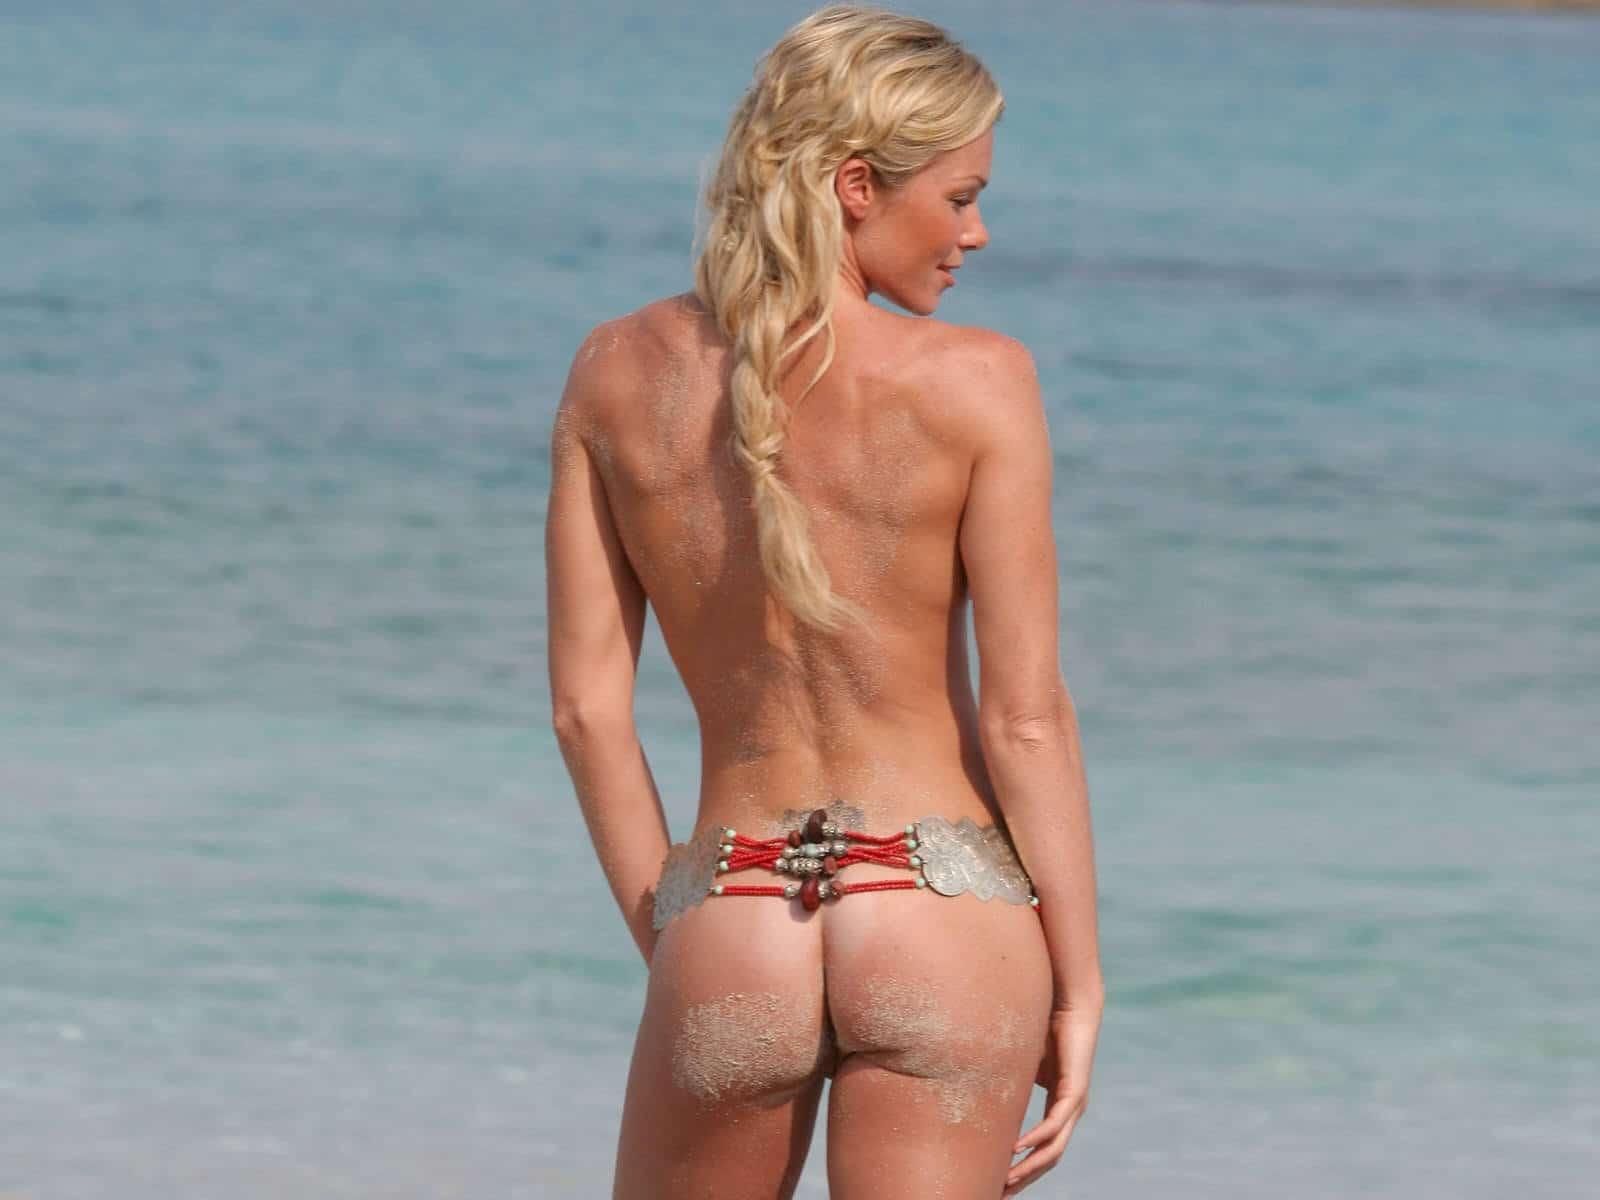 Nell mcandrew nude beach